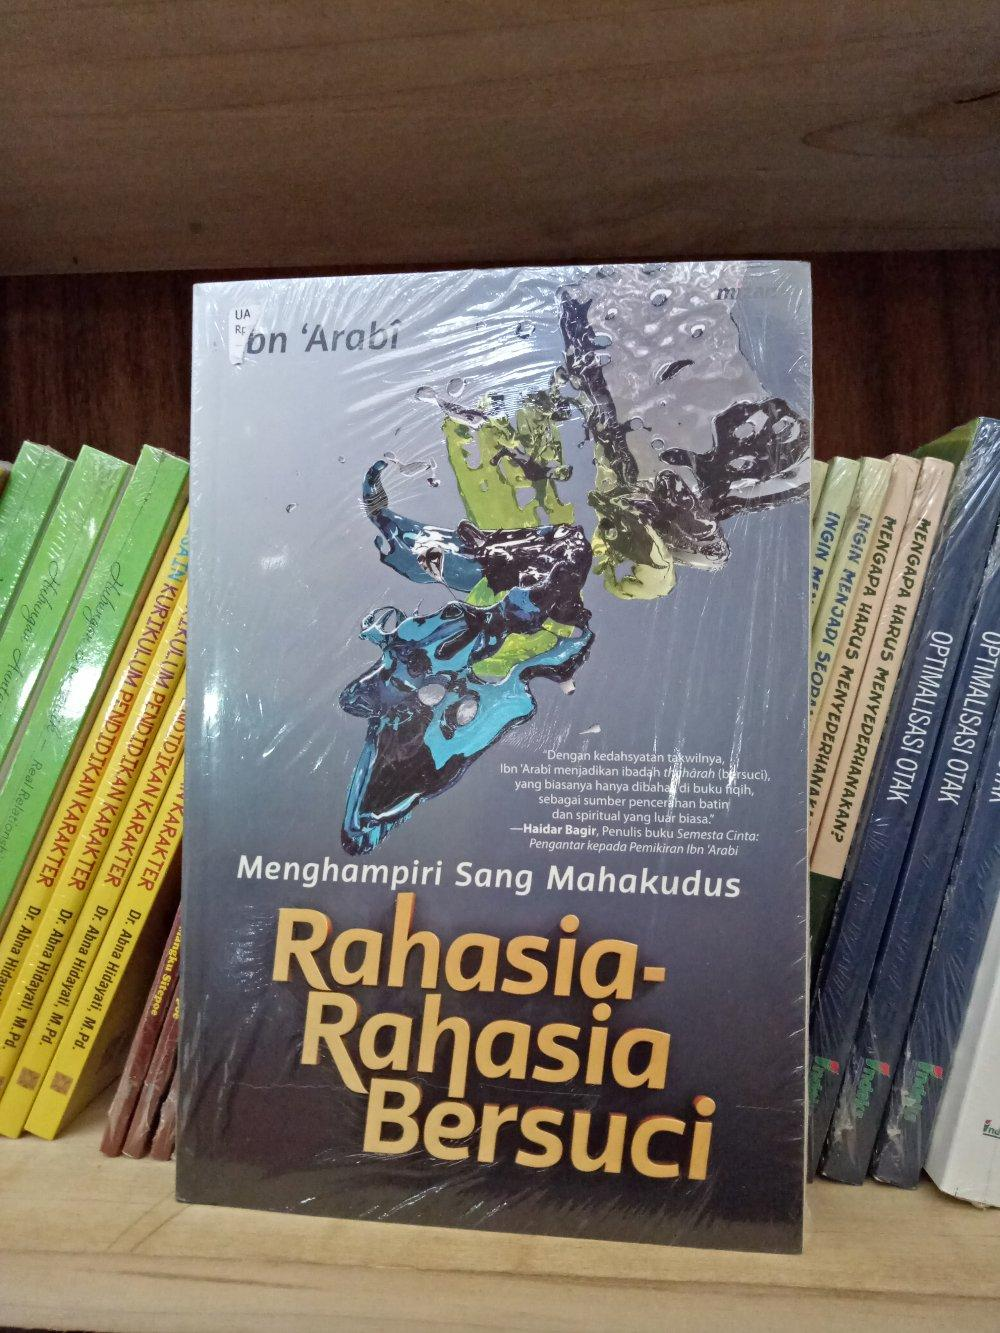 Menghampiri Sang Maha Kudus Rahasia Rahasia Bersuci - Ibn Arabi By Metro Bookstore Malang